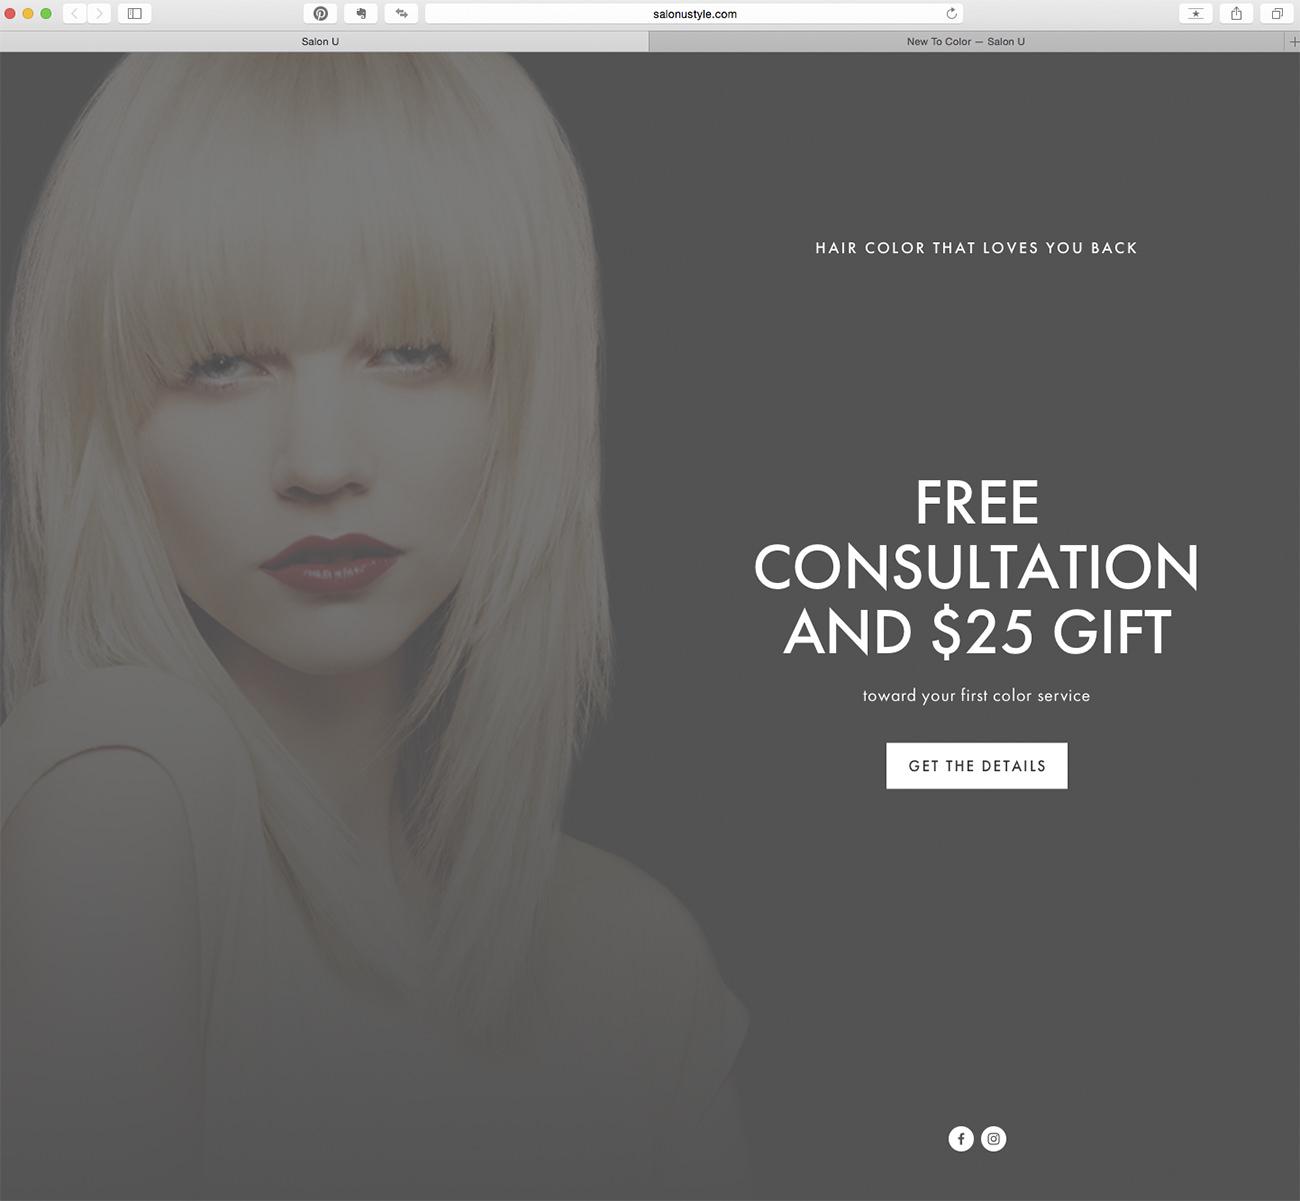 Marketing ideas for hair salons. Salon-U example.